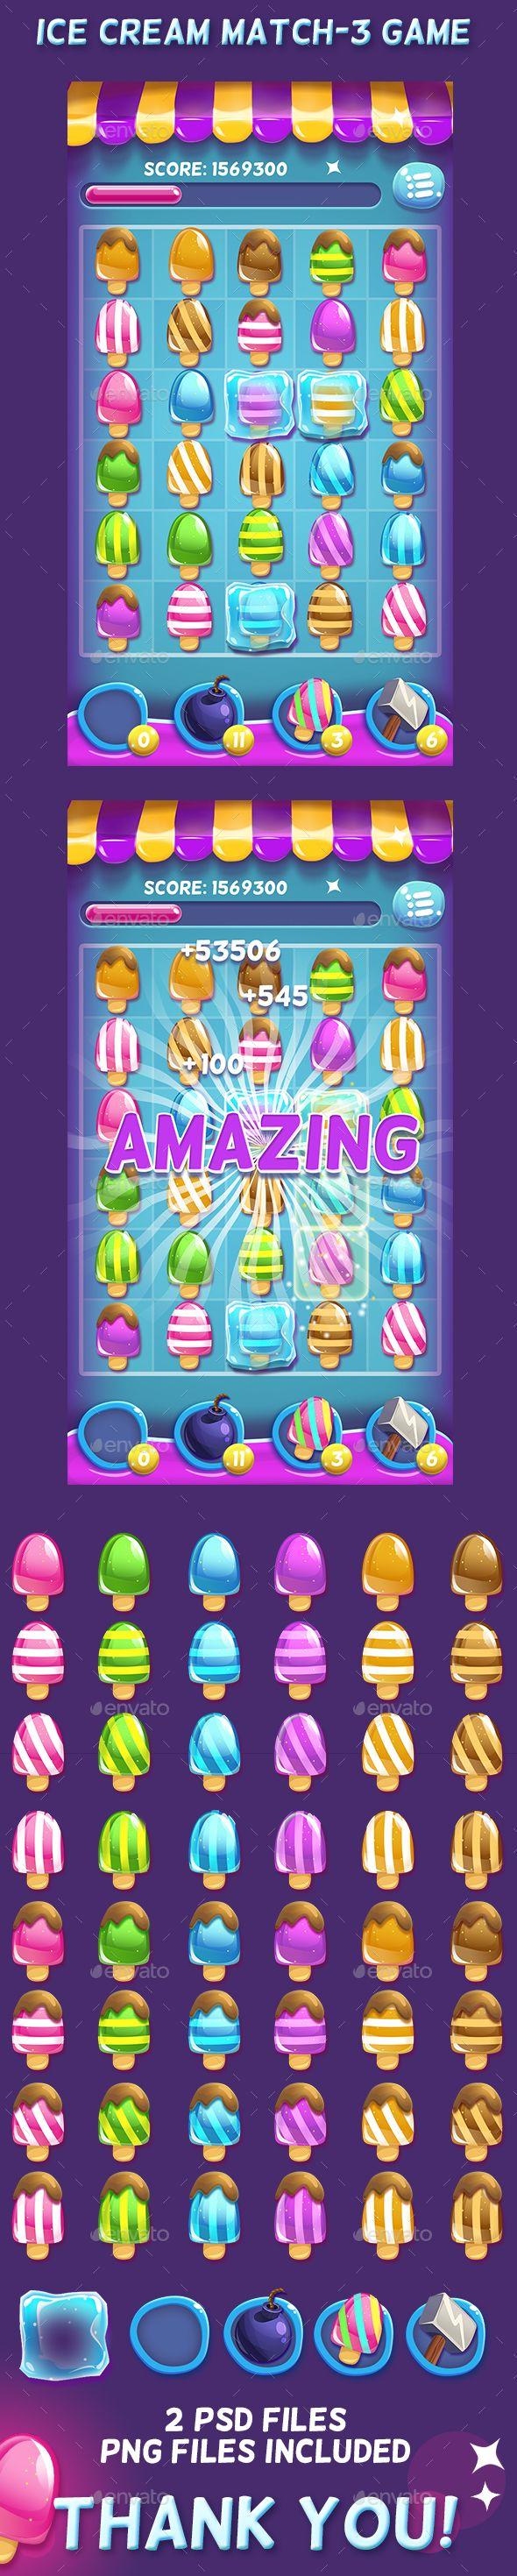 Ice Cream Match-3 Game Set (Miscellaneous)